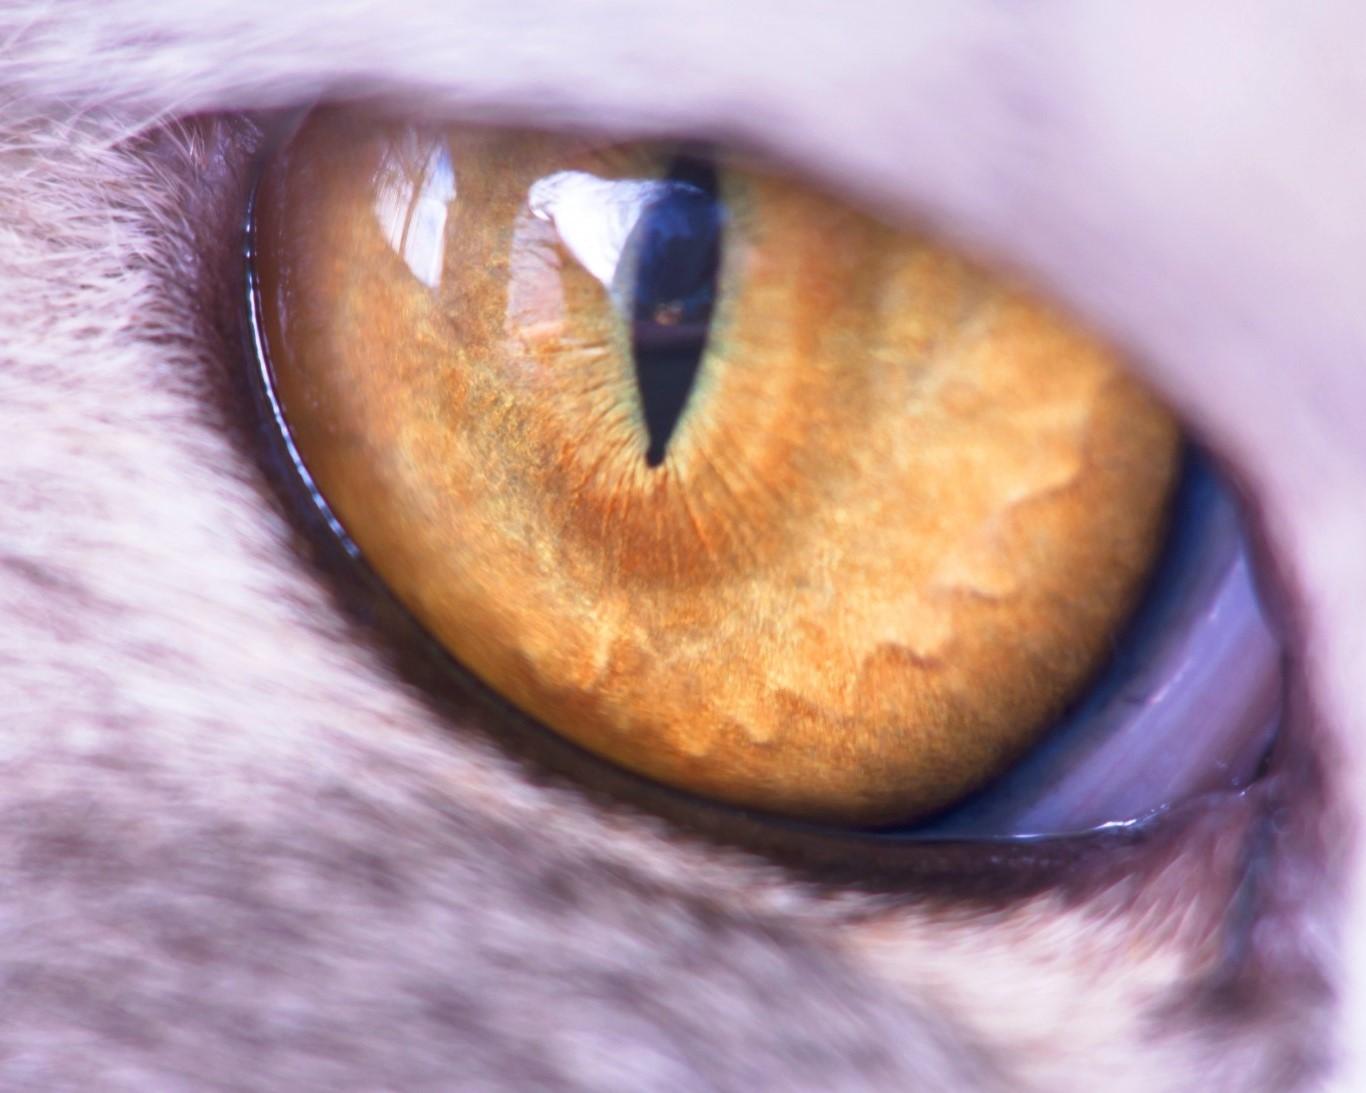 close-up-of-the-yellow-cat-eye.jpg